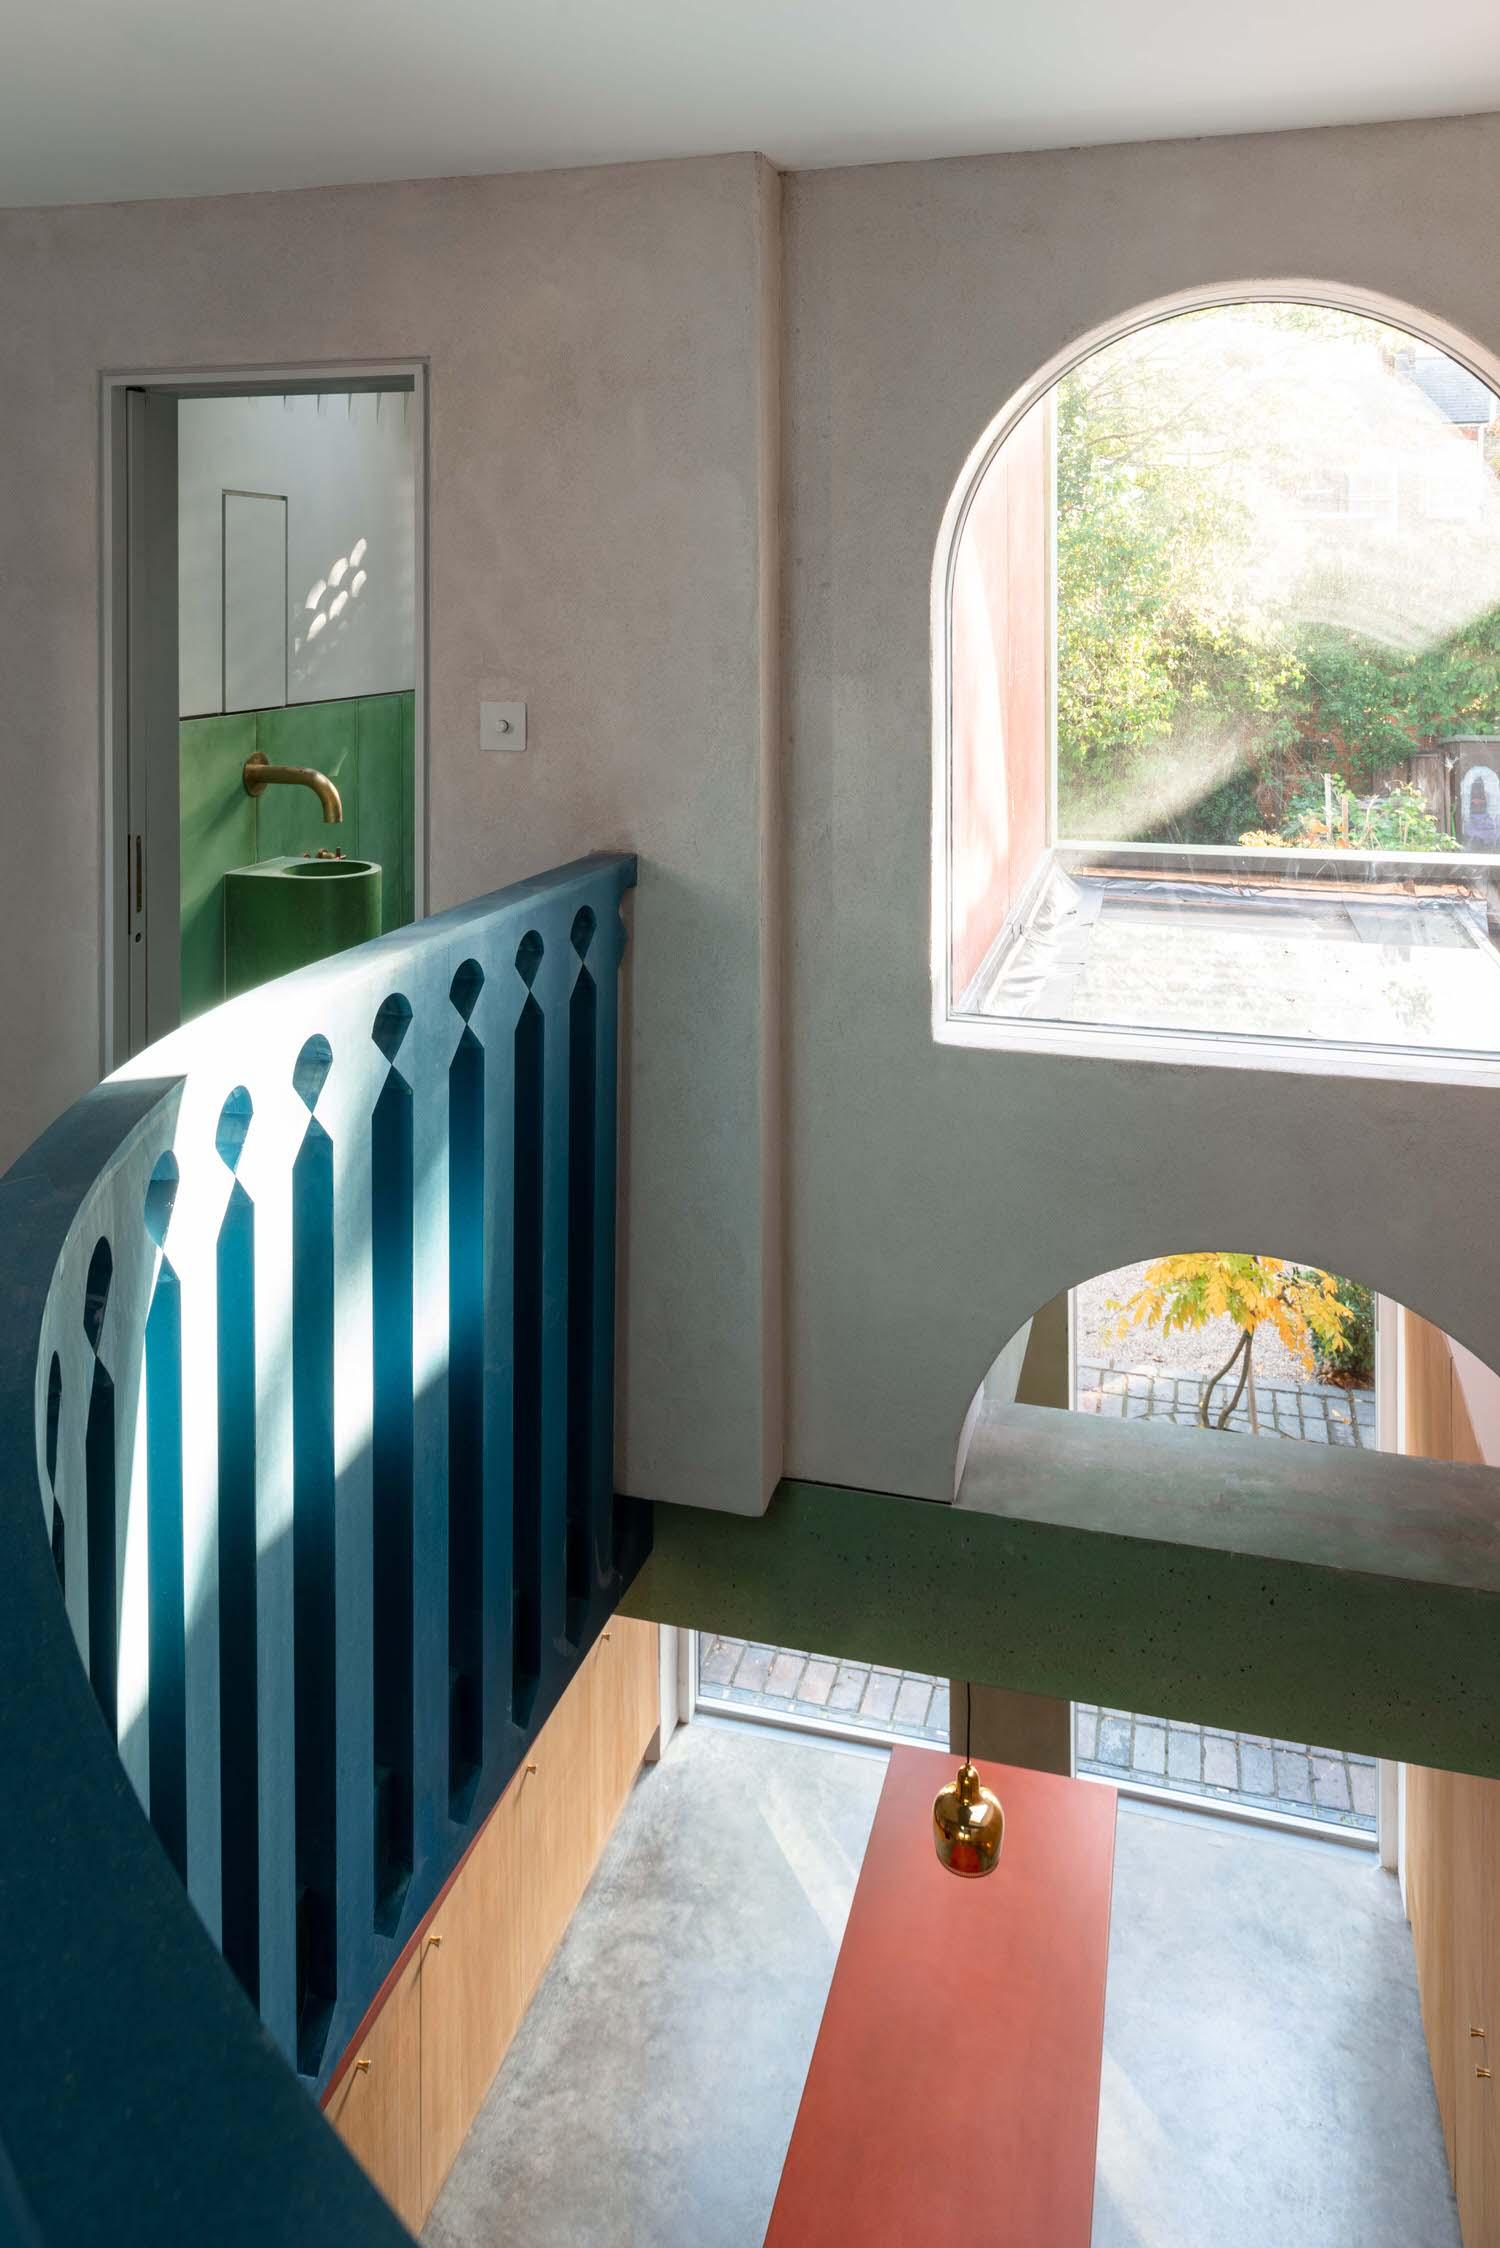 Studio Ben Allen House Recast London Residential Architecture Photo French+tye Yellowtrace 13